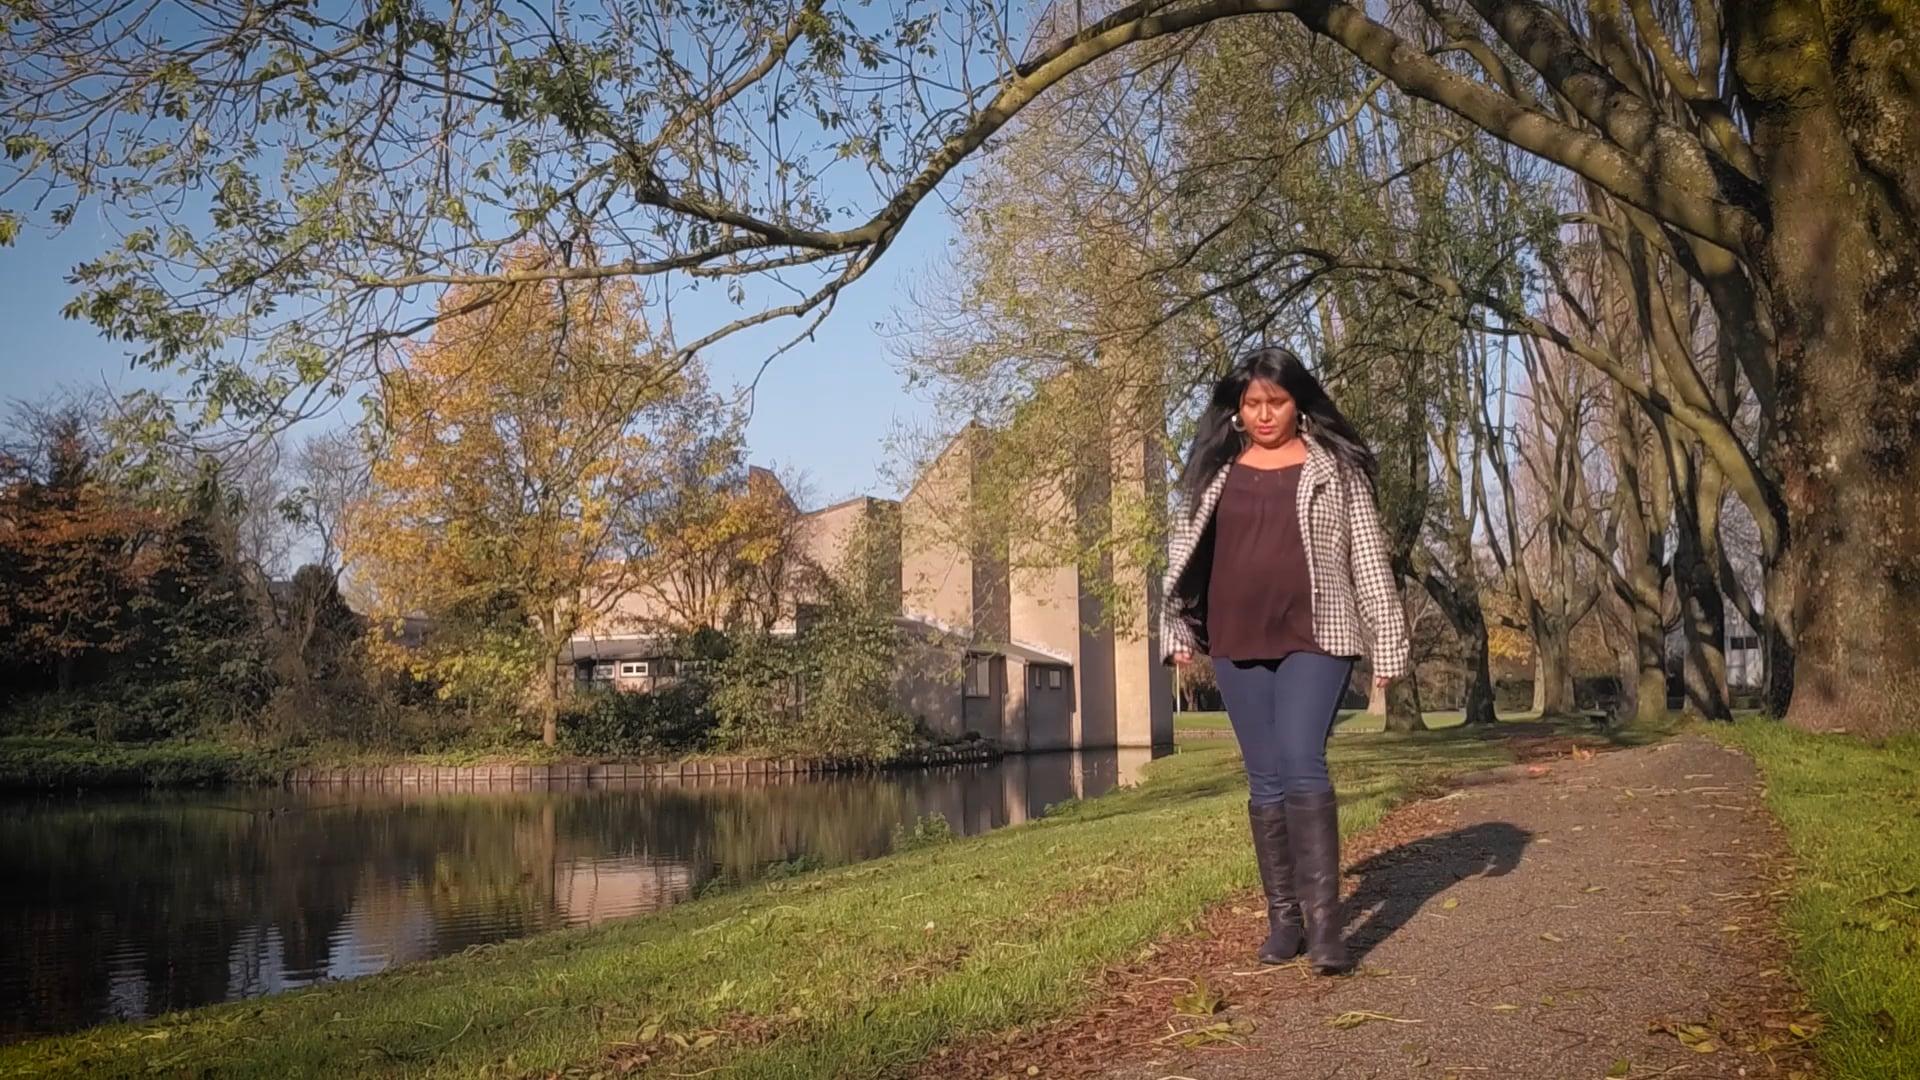 Angela uit Amstelveen